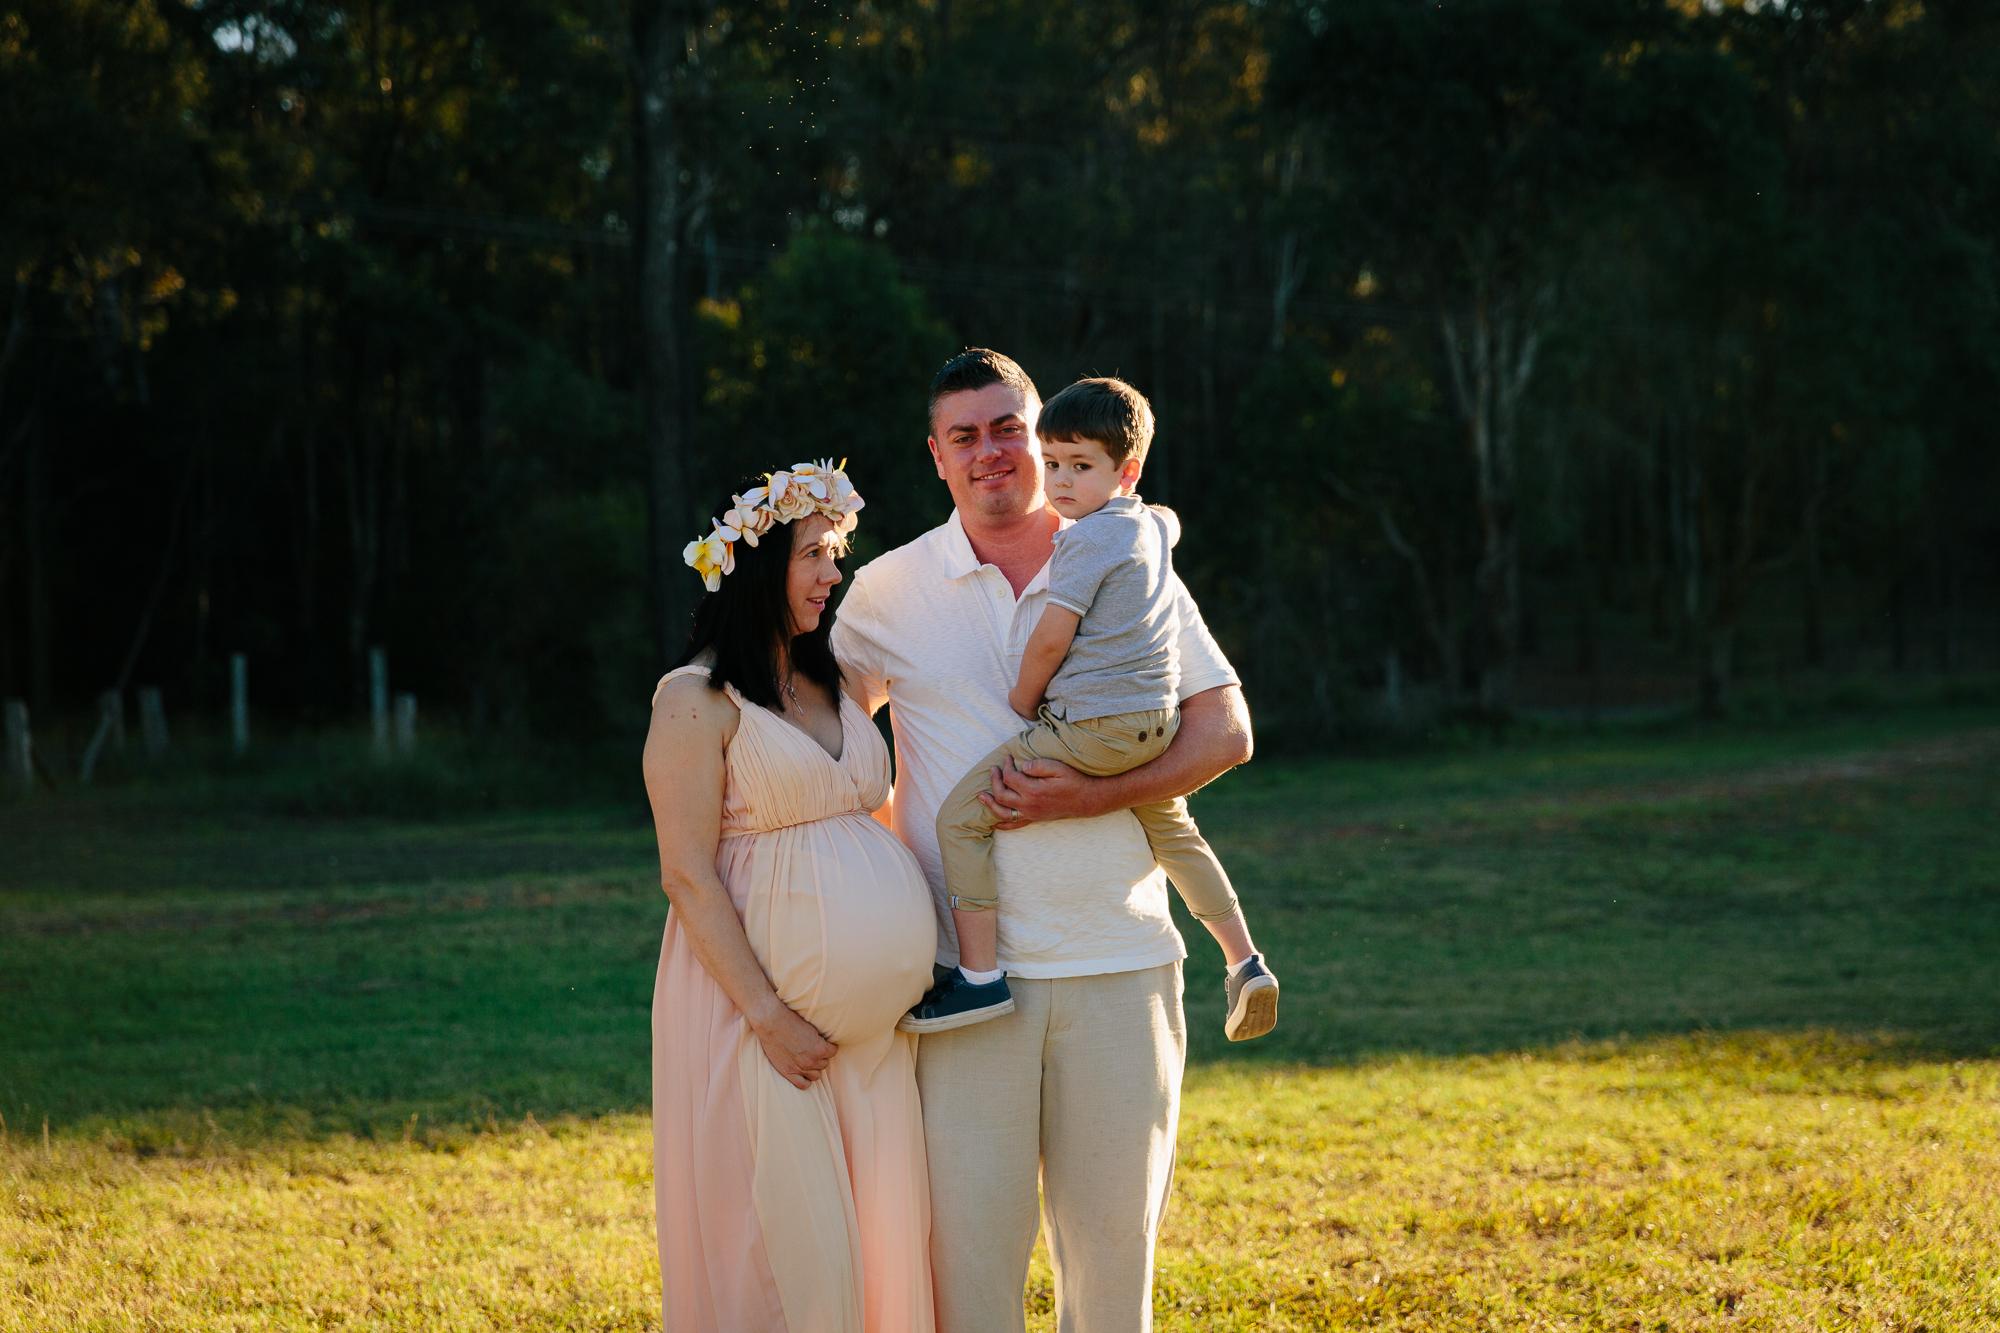 057_Maternity Lifetsyle_Shelley_Sunlight Photography.JPG